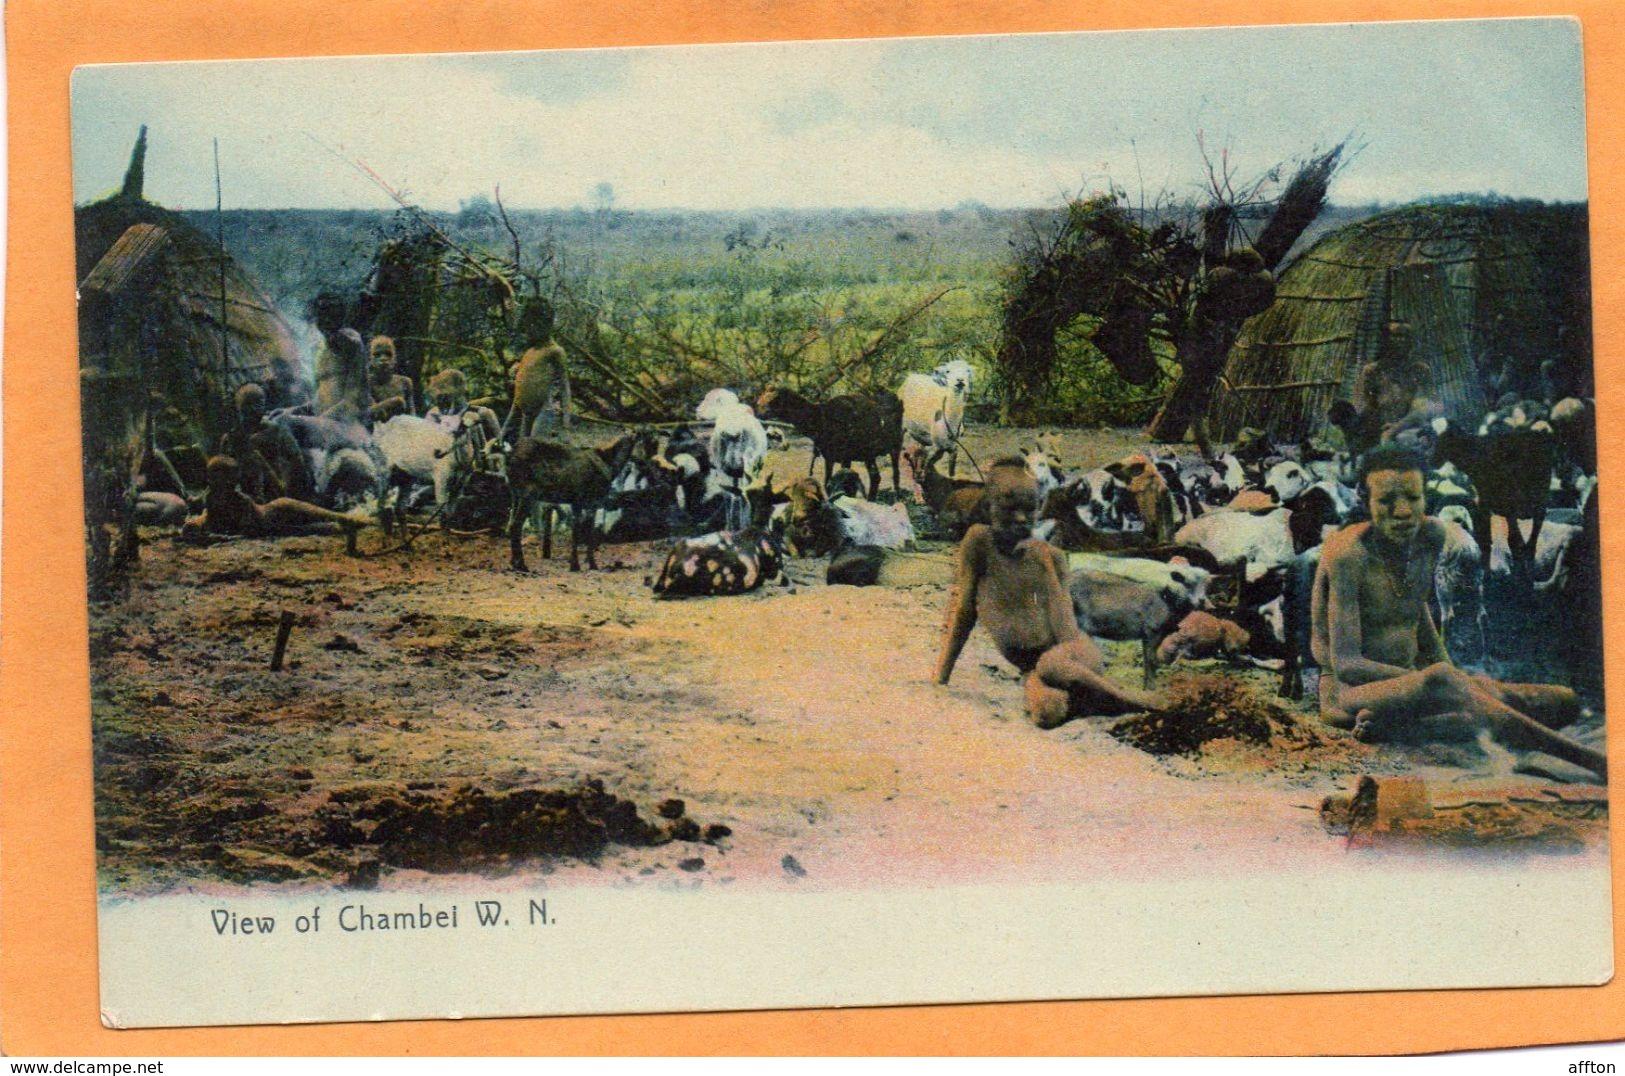 Chambei WN Sudan 1905 Postcard - Soudan